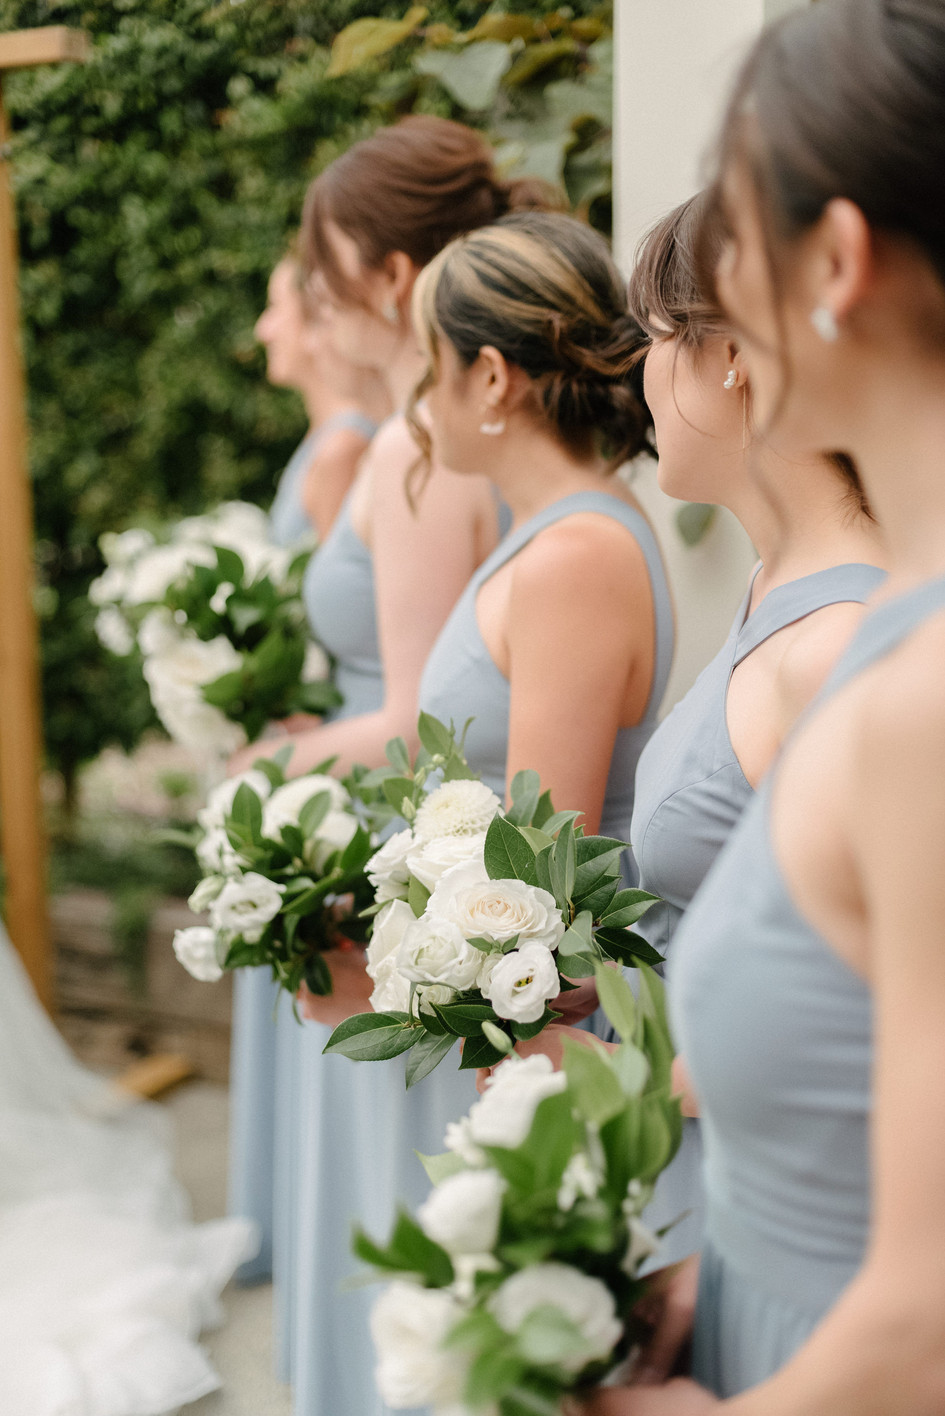 blue_bridesmaids_dresses.jpg